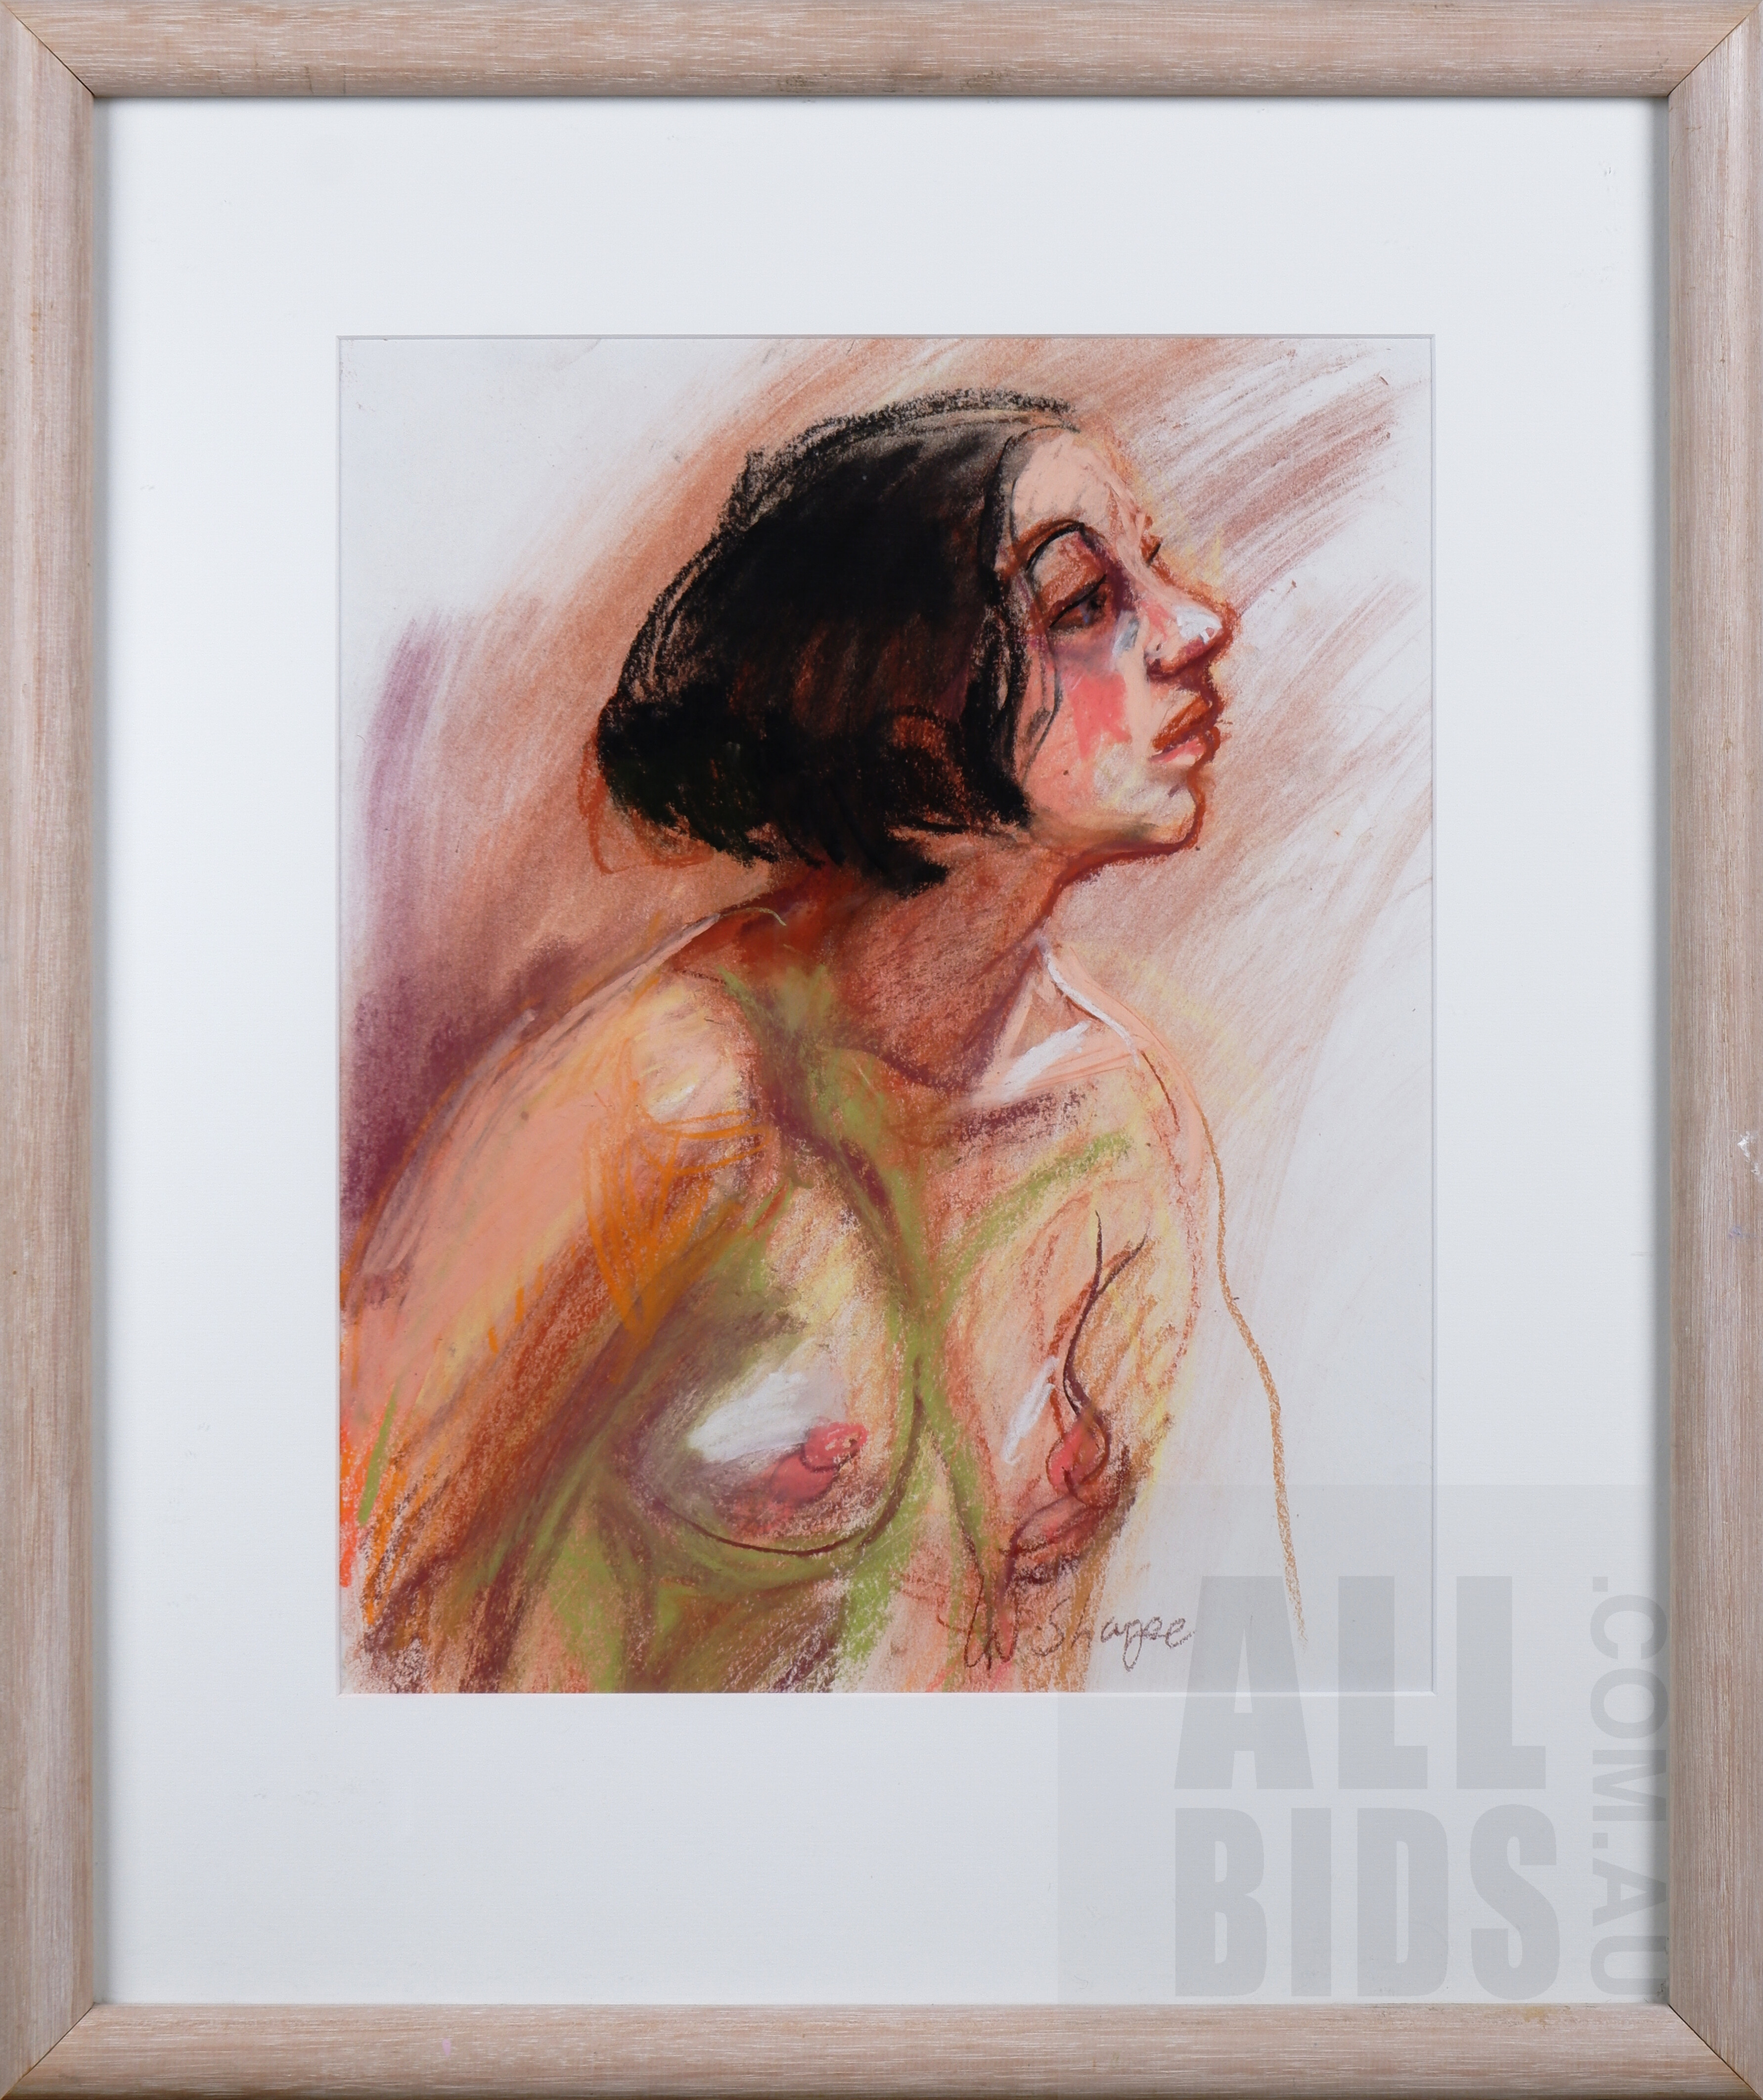 'Wendy Sharpe (born 1960), Untitled (Nude), Pastel, 35 x 29 cm'